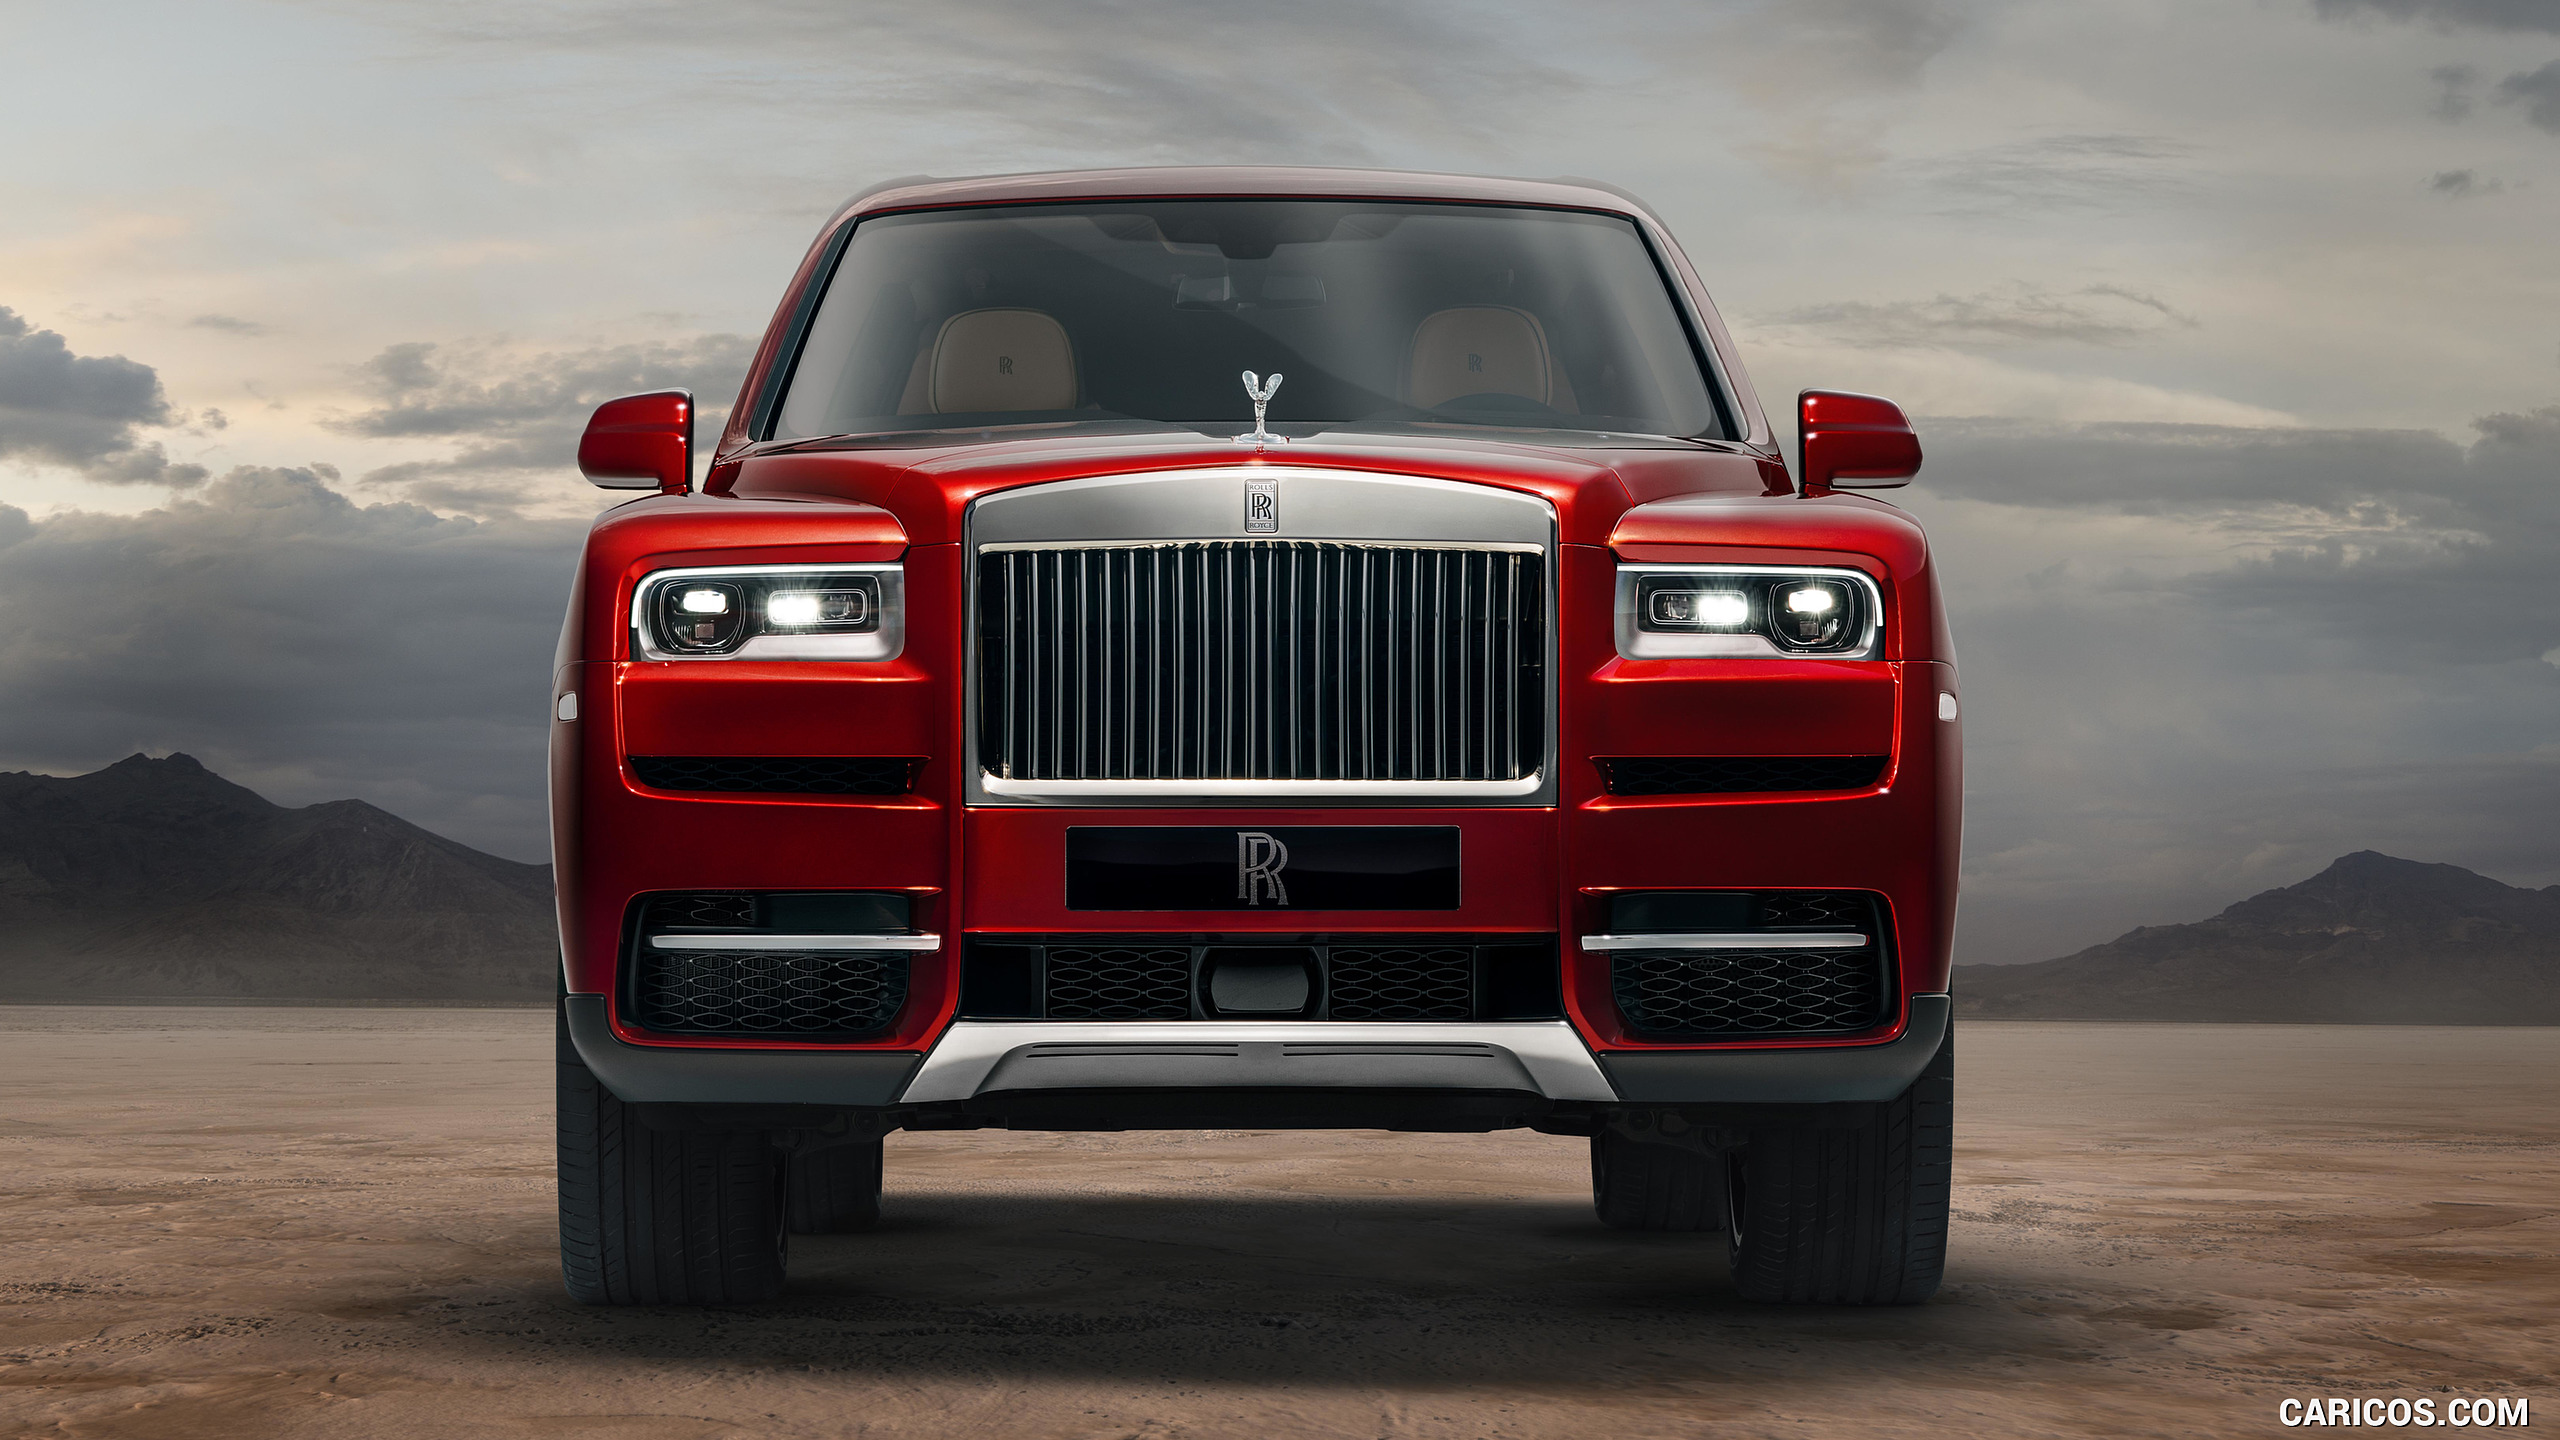 26 Rolls Royce Cullinan Wallpapers On Wallpapersafari